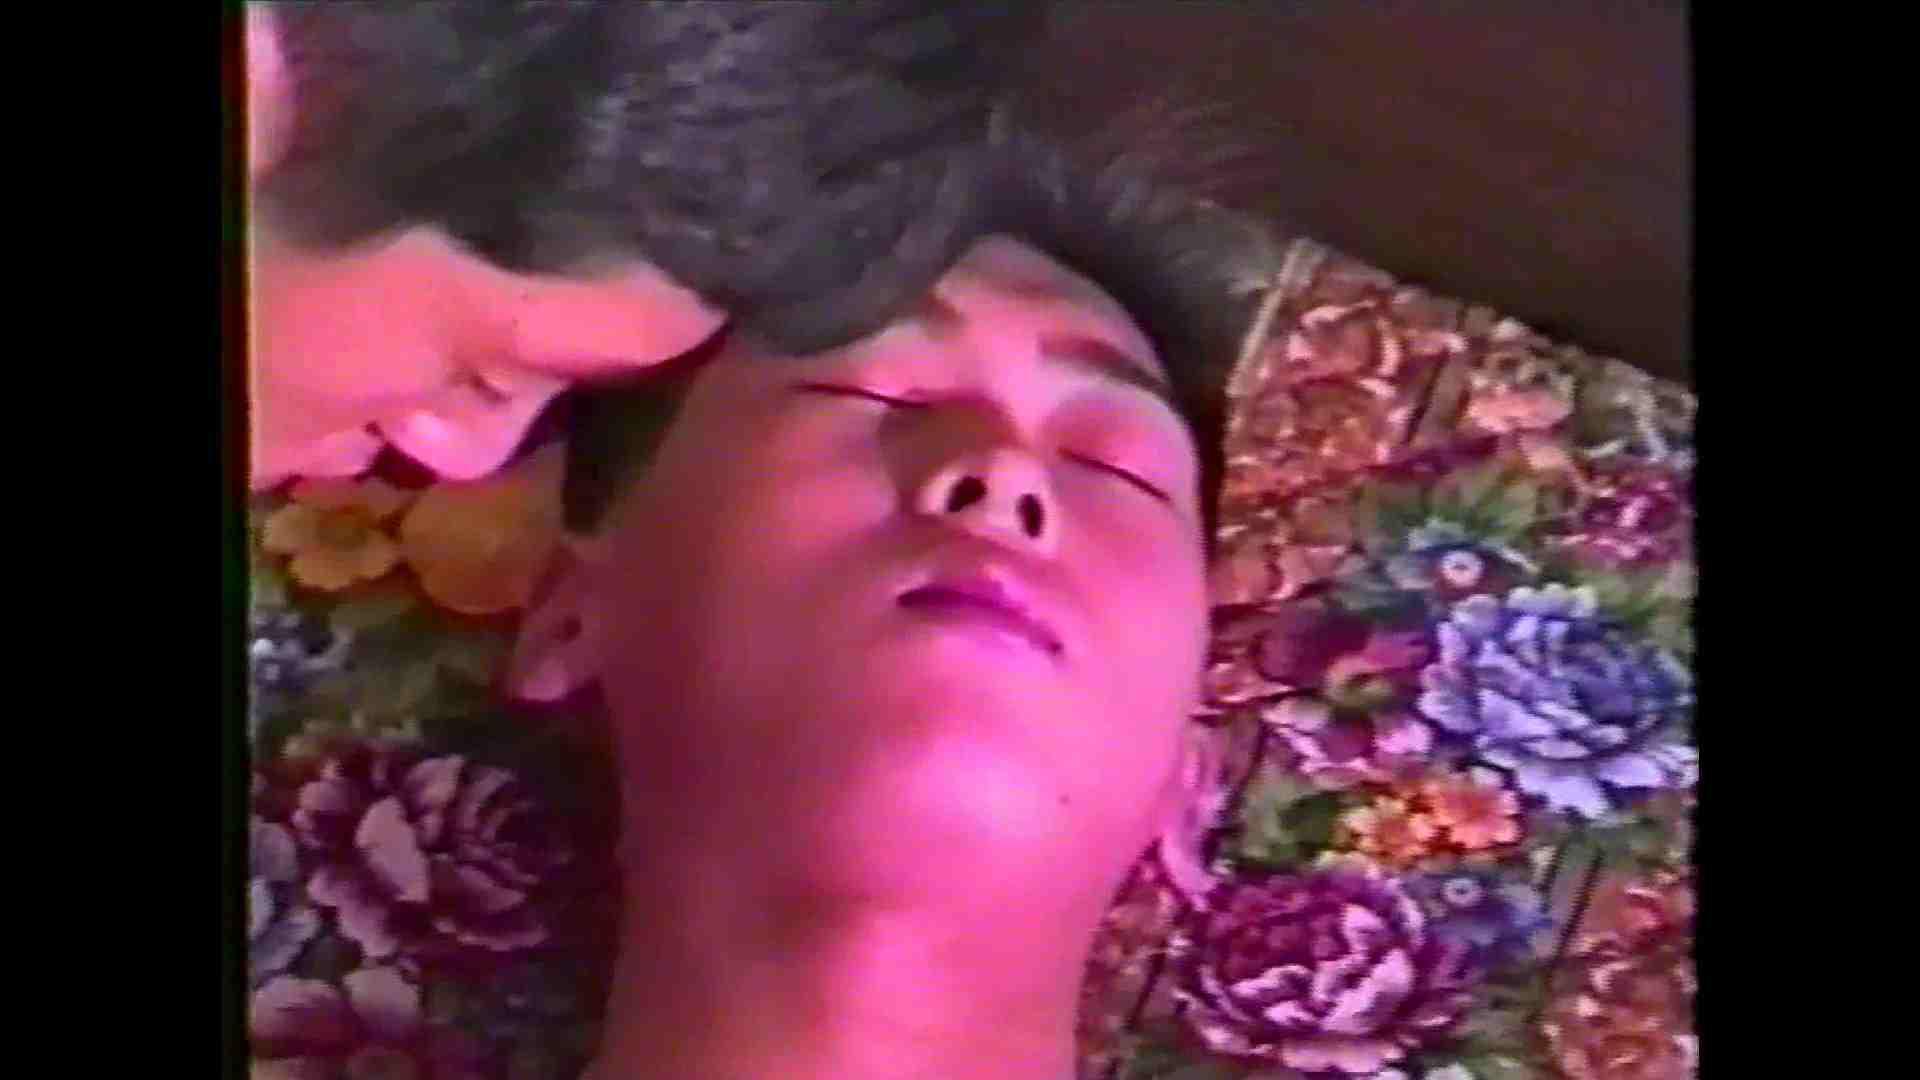 GAYBOY宏のオカズ倉庫Vol.12-2 シックスナイン69 ゲイヌード画像 99枚 11